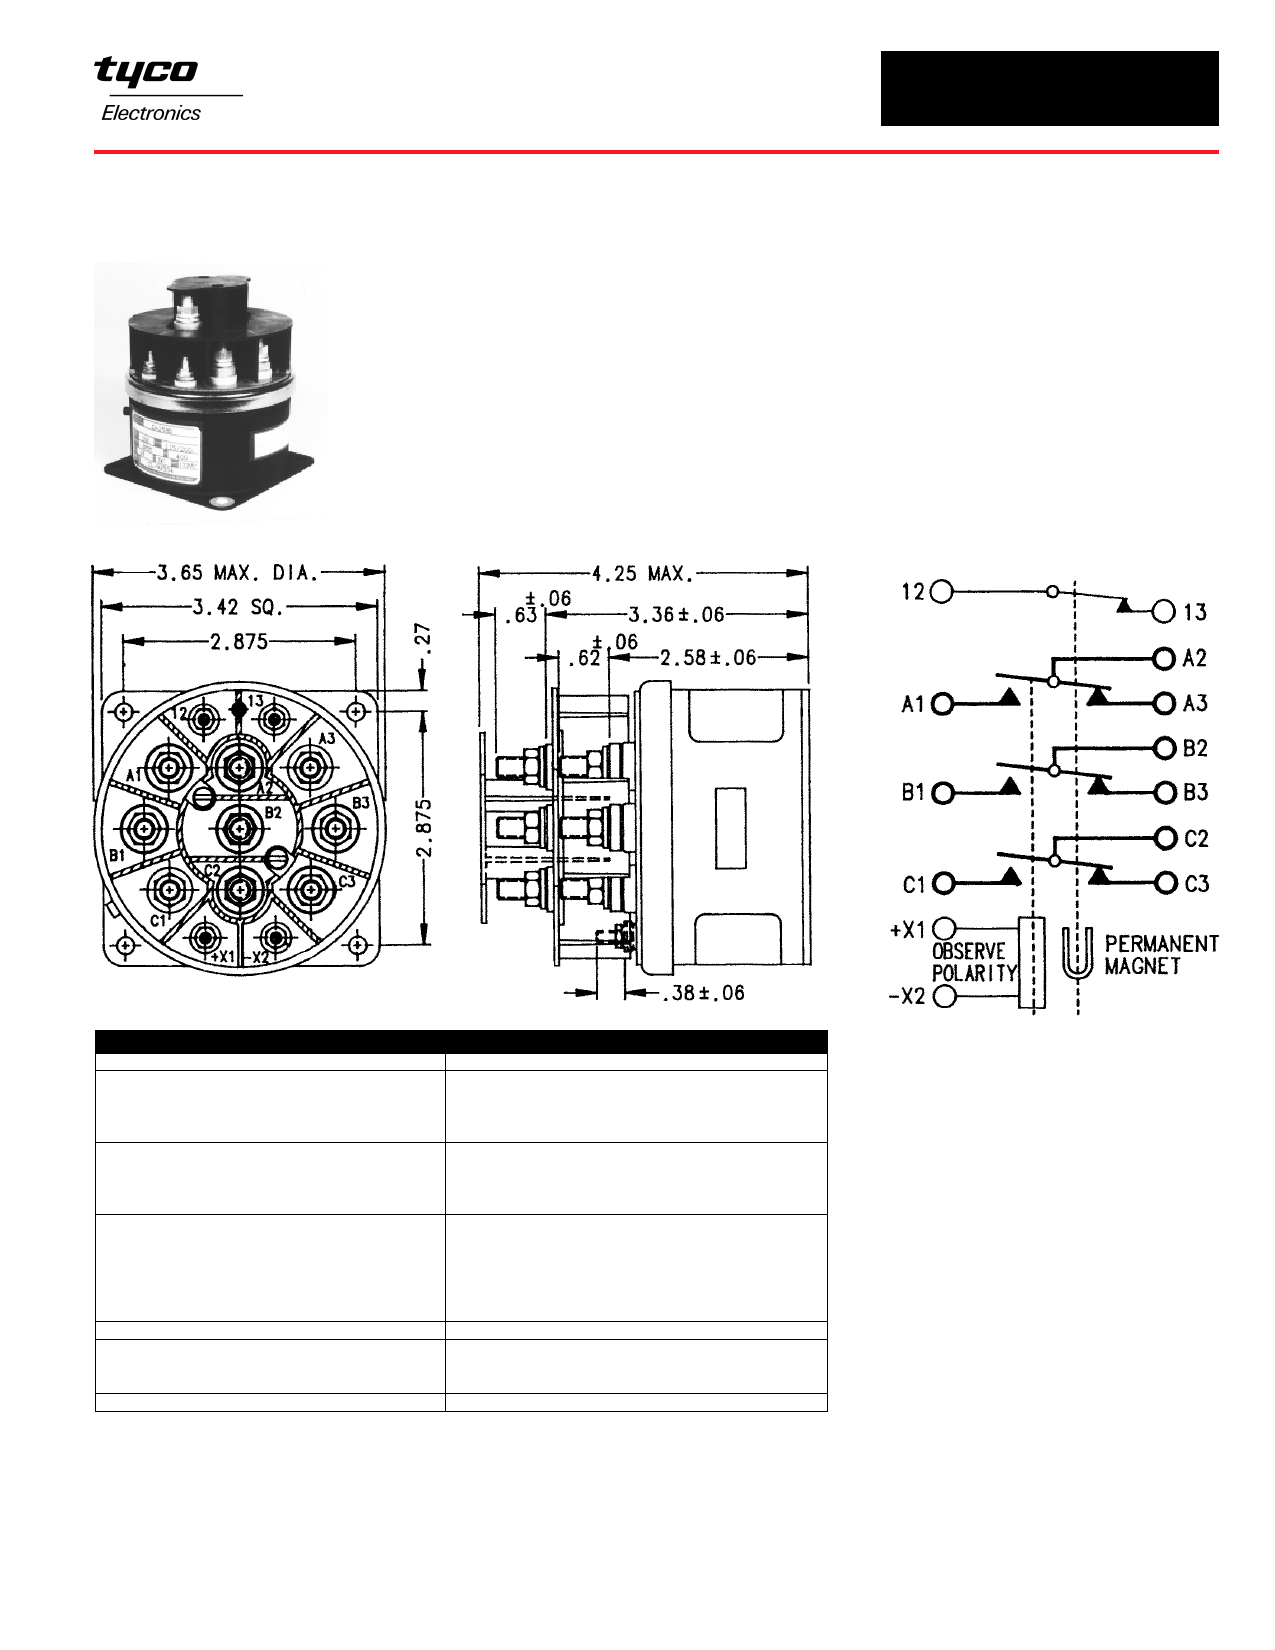 D-25BD Hoja de datos, Descripción, Manual